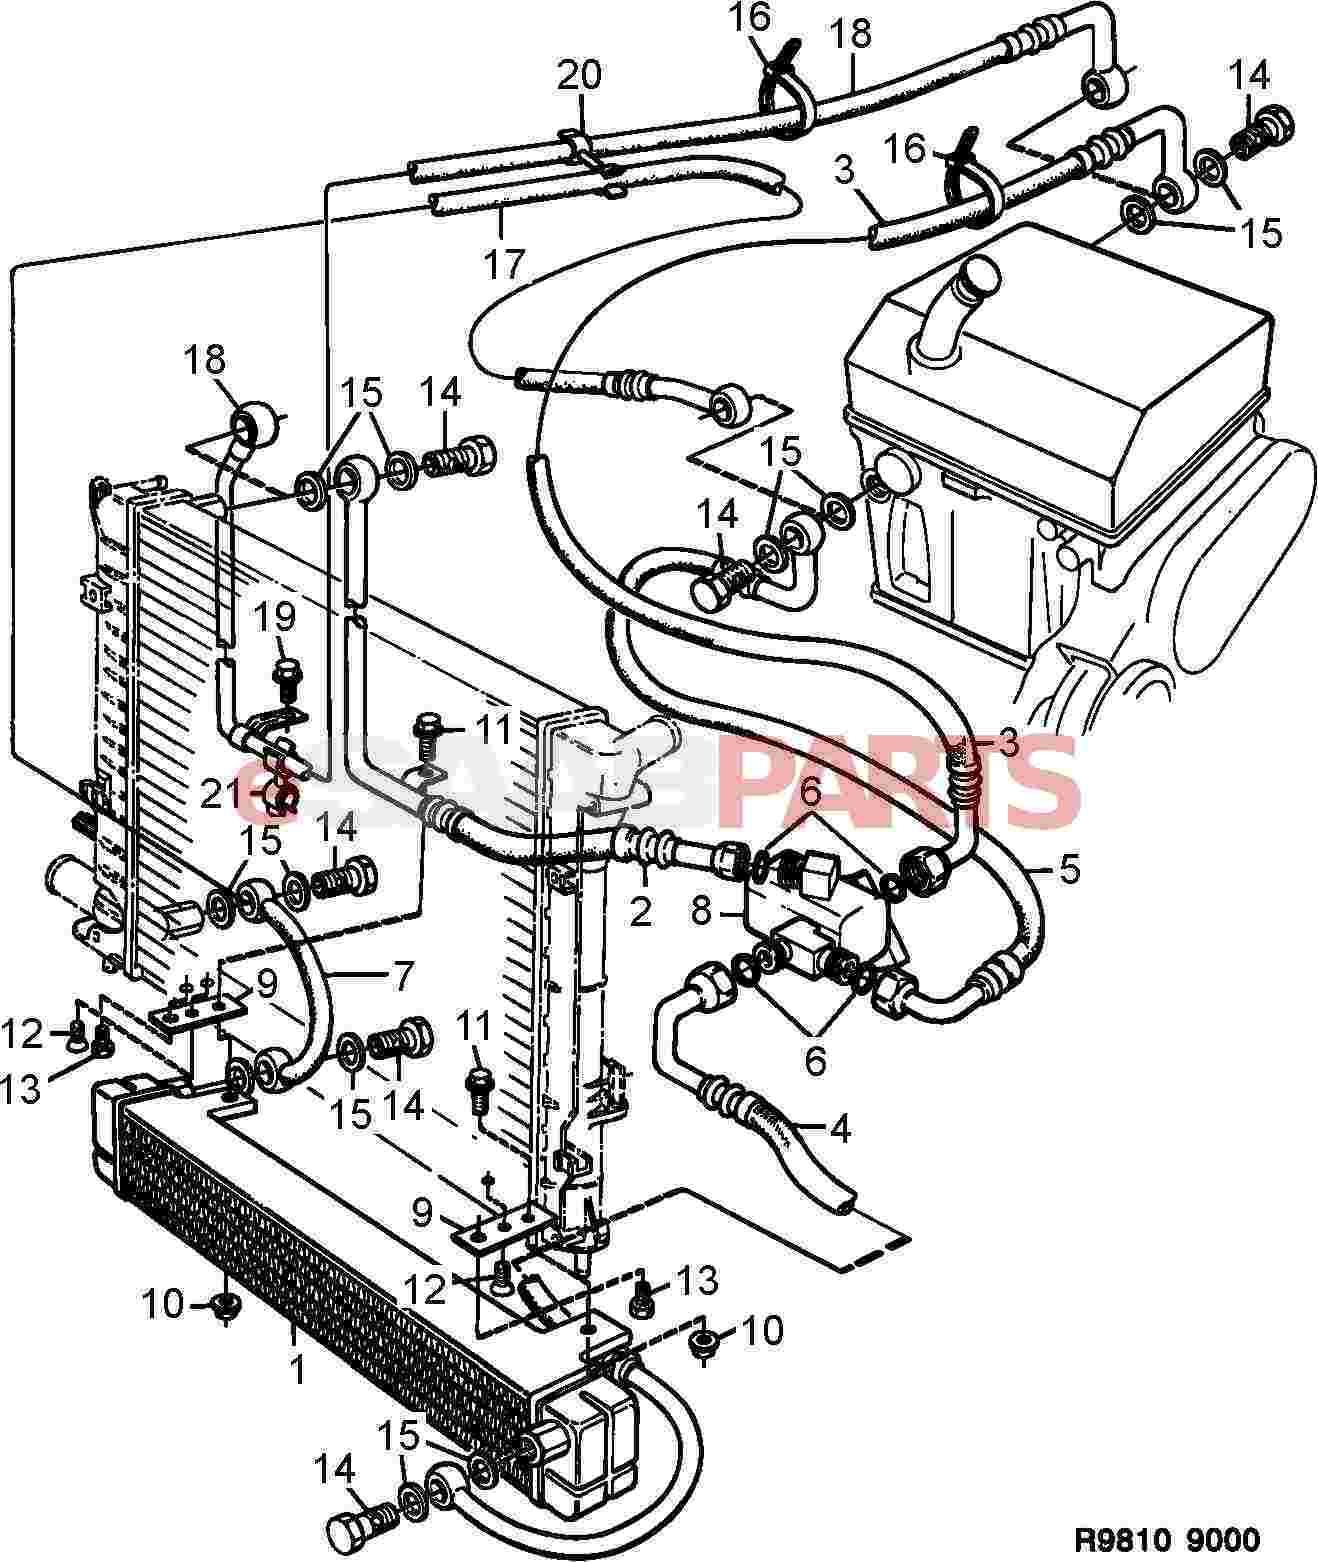 saab 9 3 manual transmission diagram